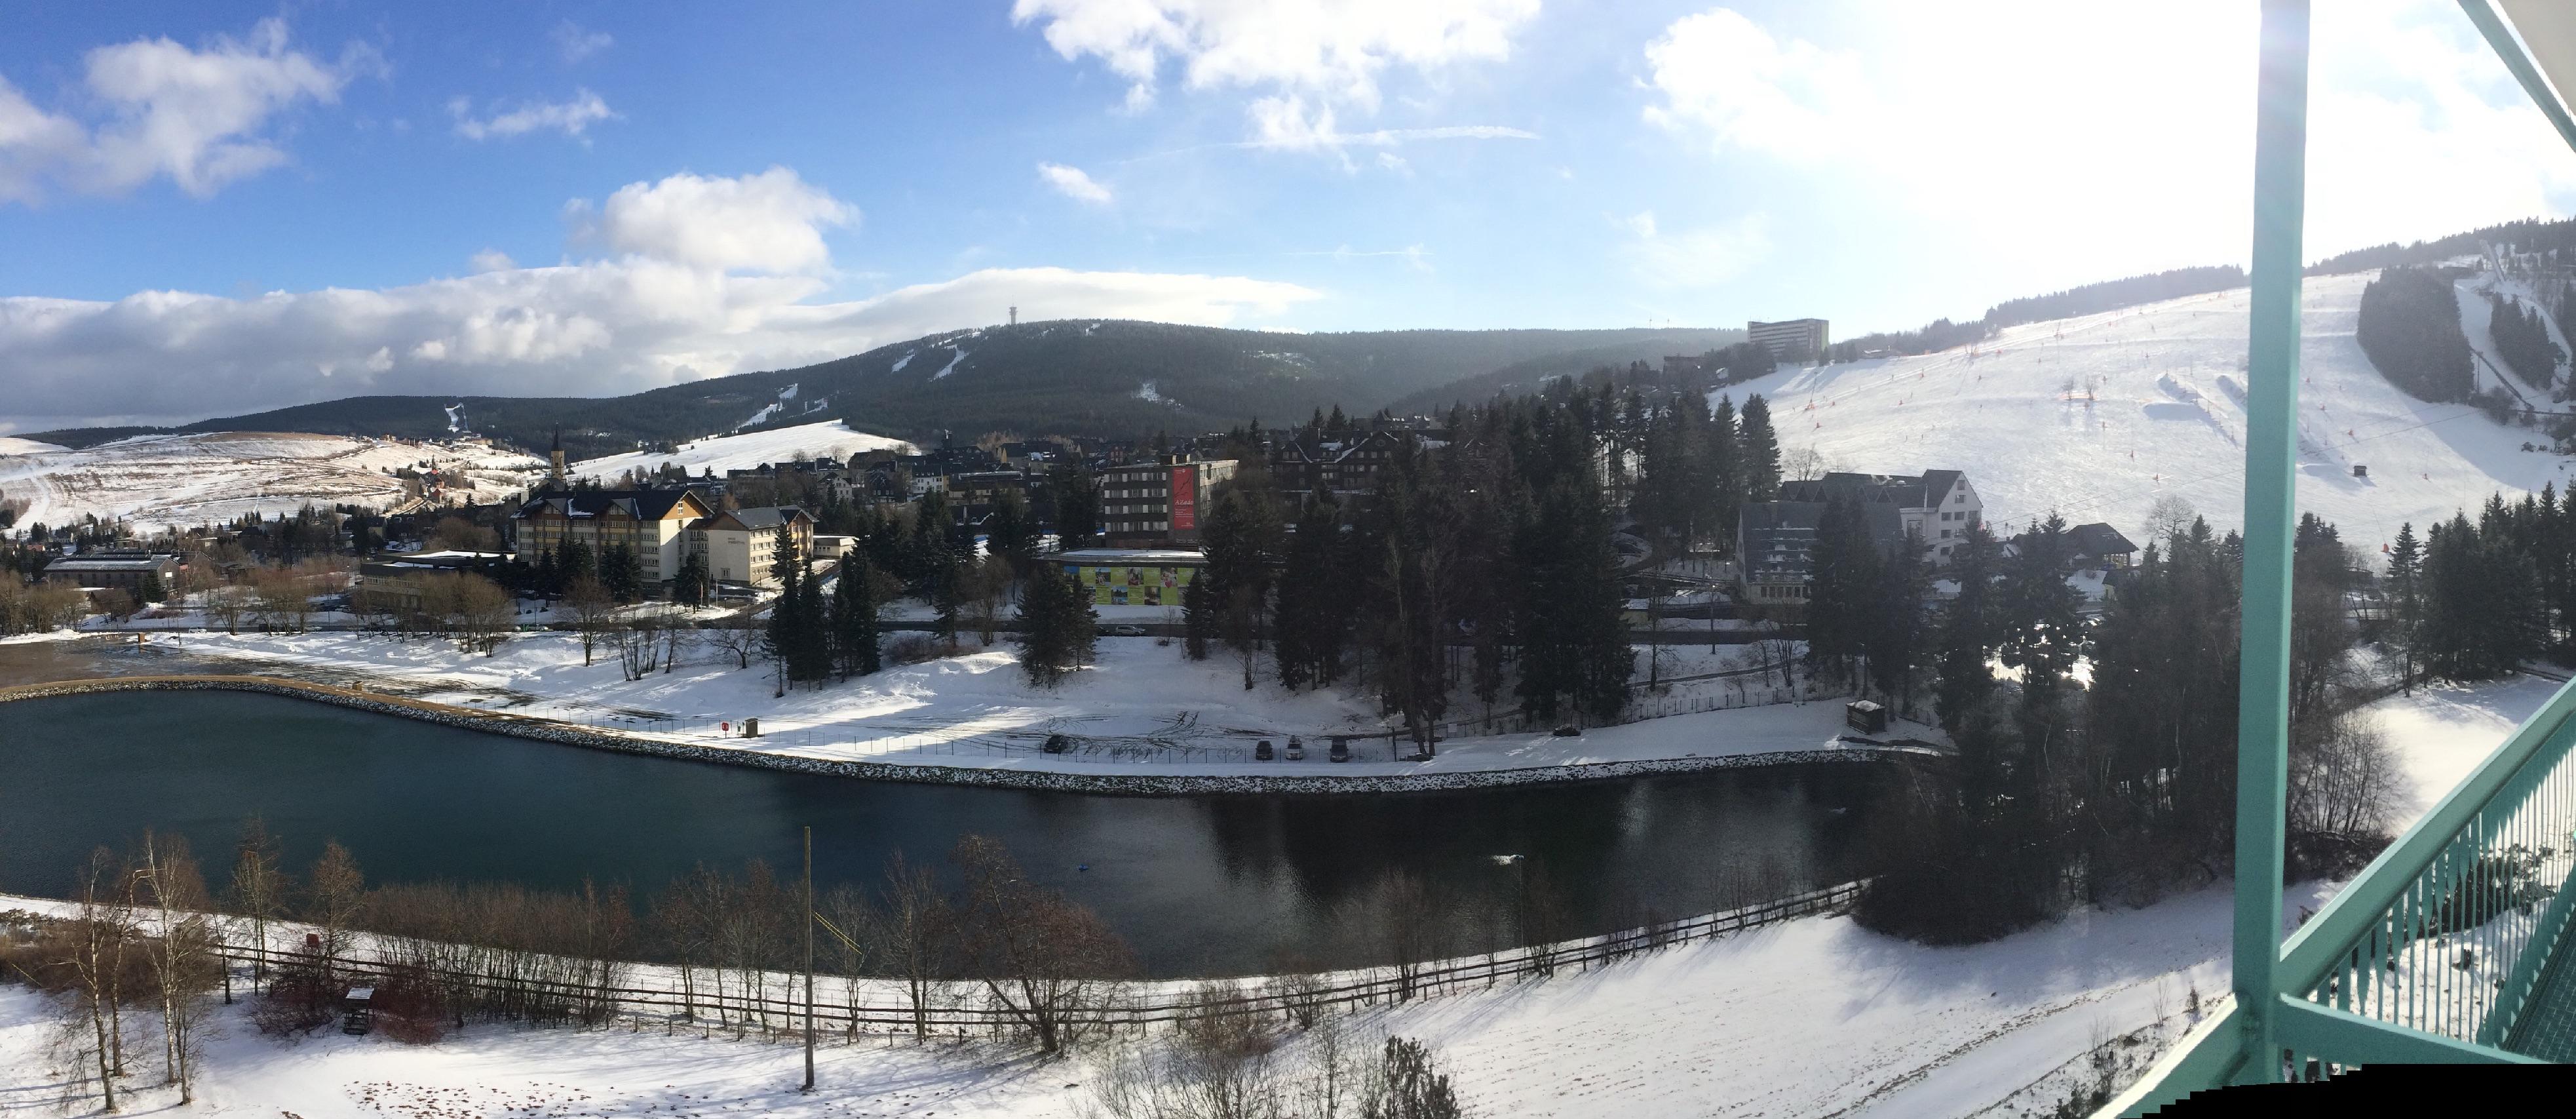 Hotel Oberwiesenthal Wellness